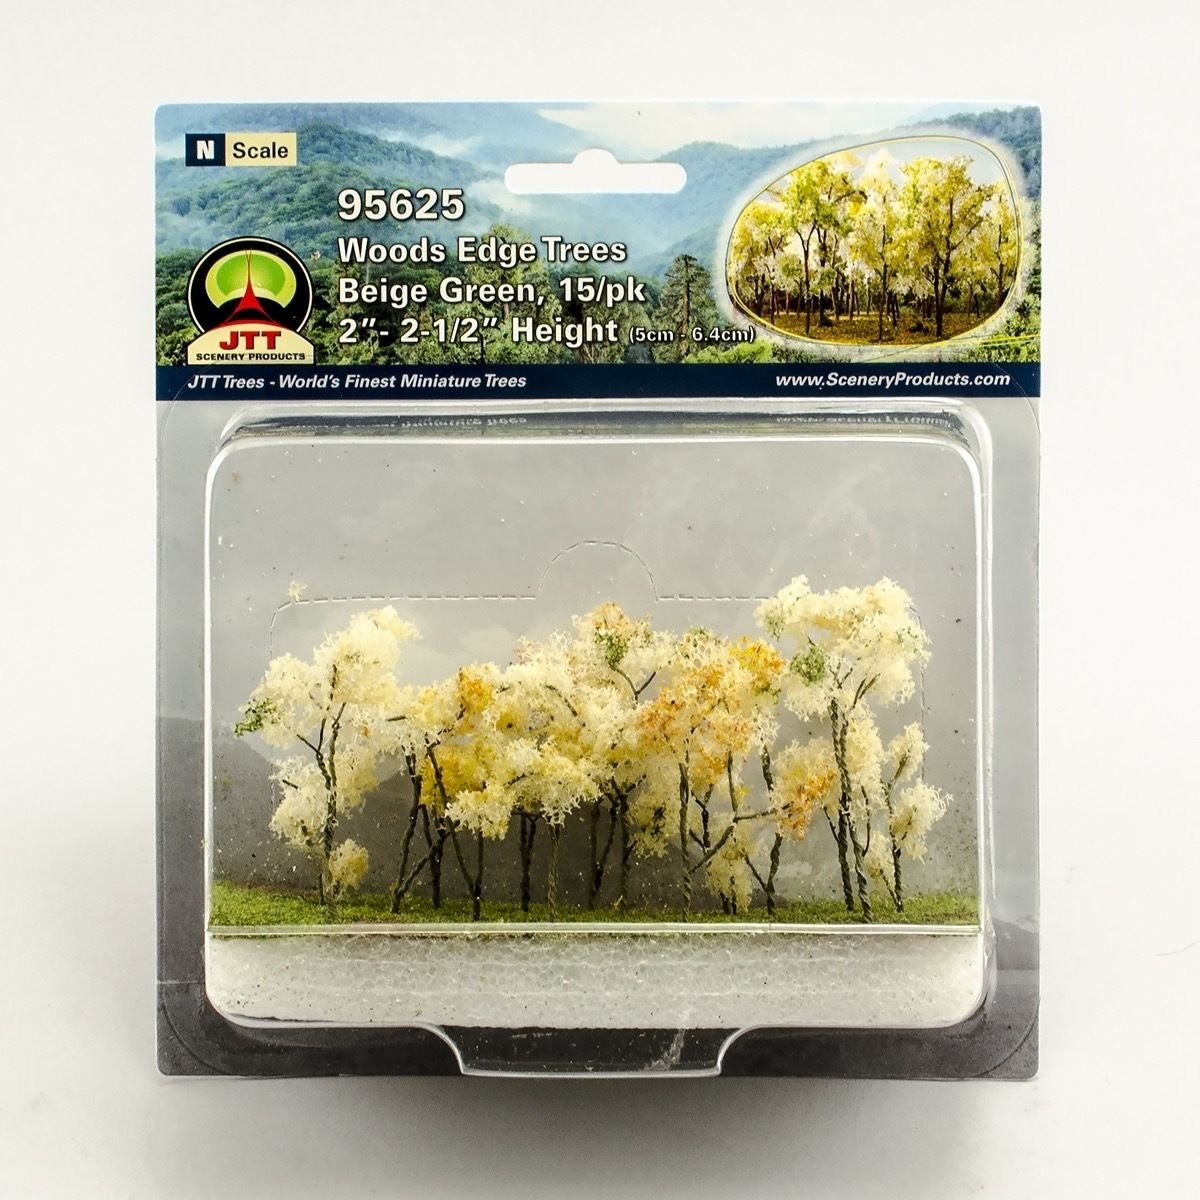 Woods Edge Trees Beige Green 2 to 2.5 N-scale 15//pk JTT